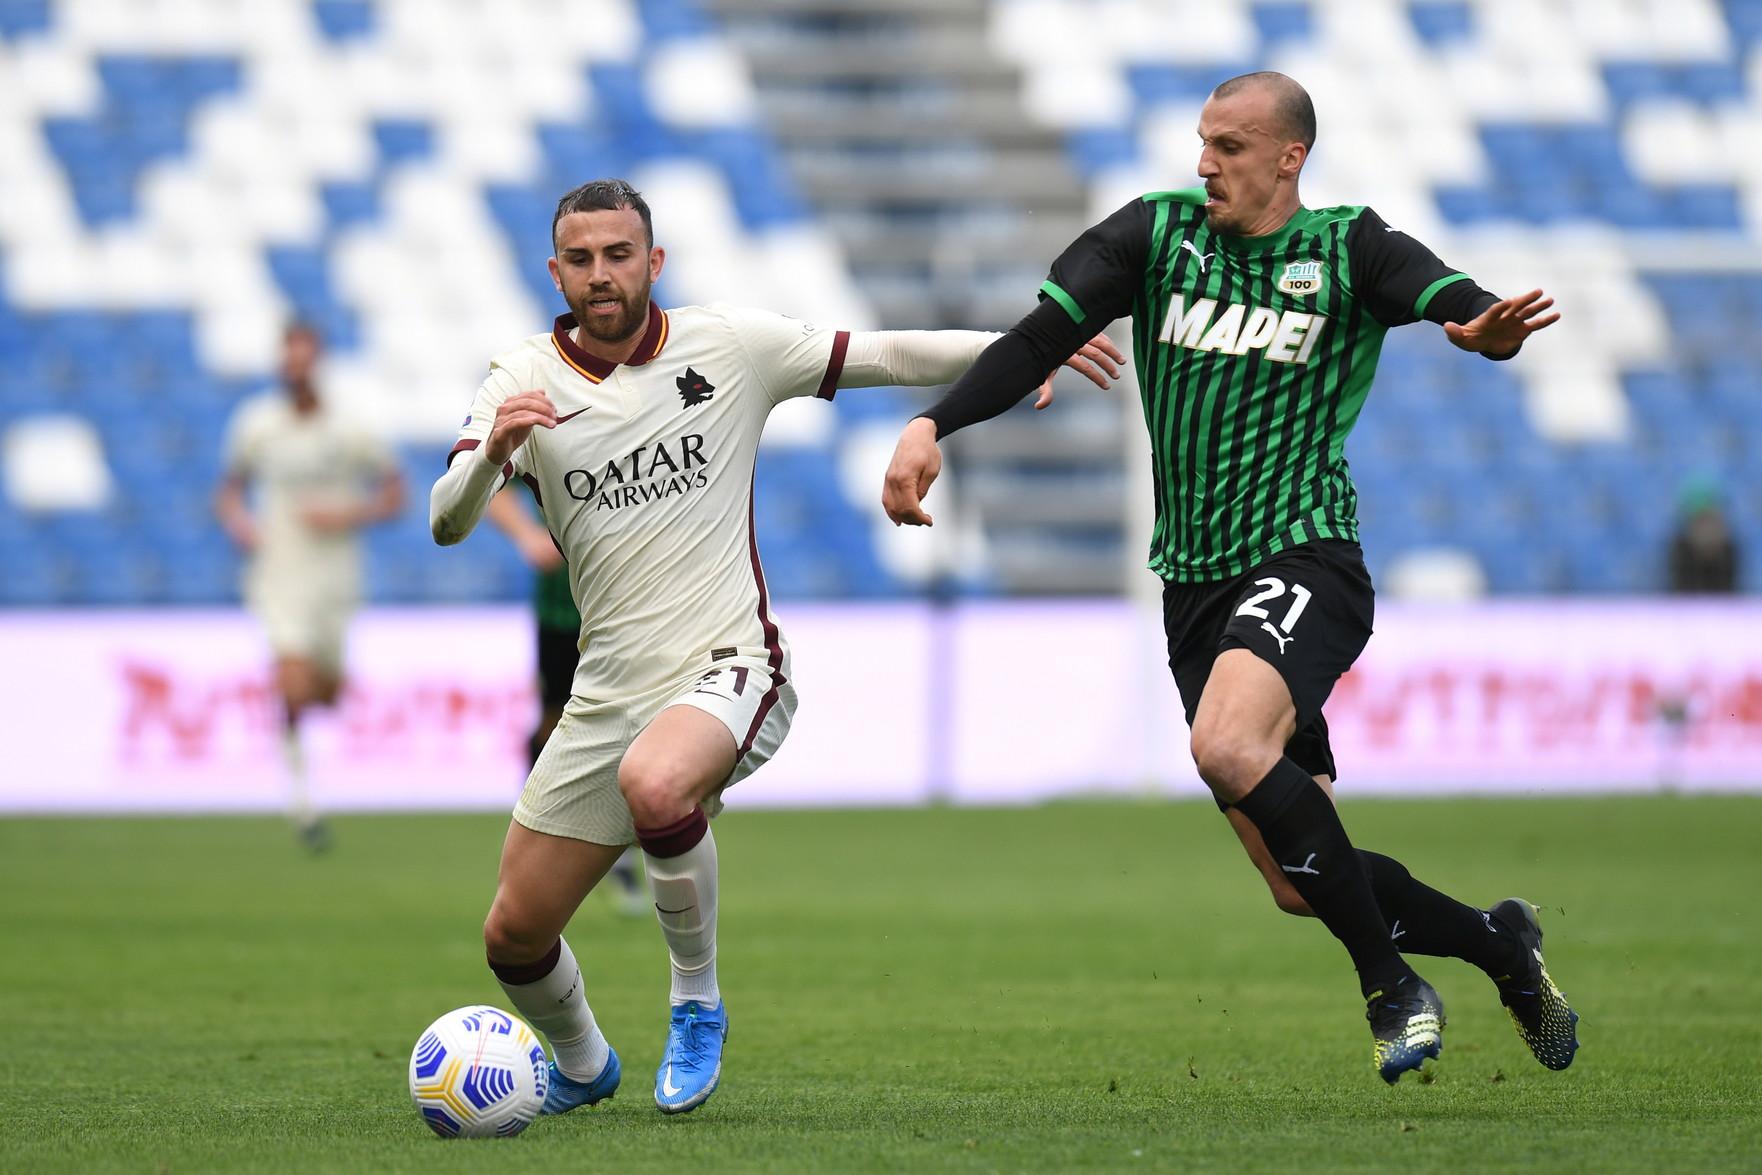 Serie A, Sassuolo-Roma 2-2: per Fonseca la Champions si allontana   News -  Sportmediaset